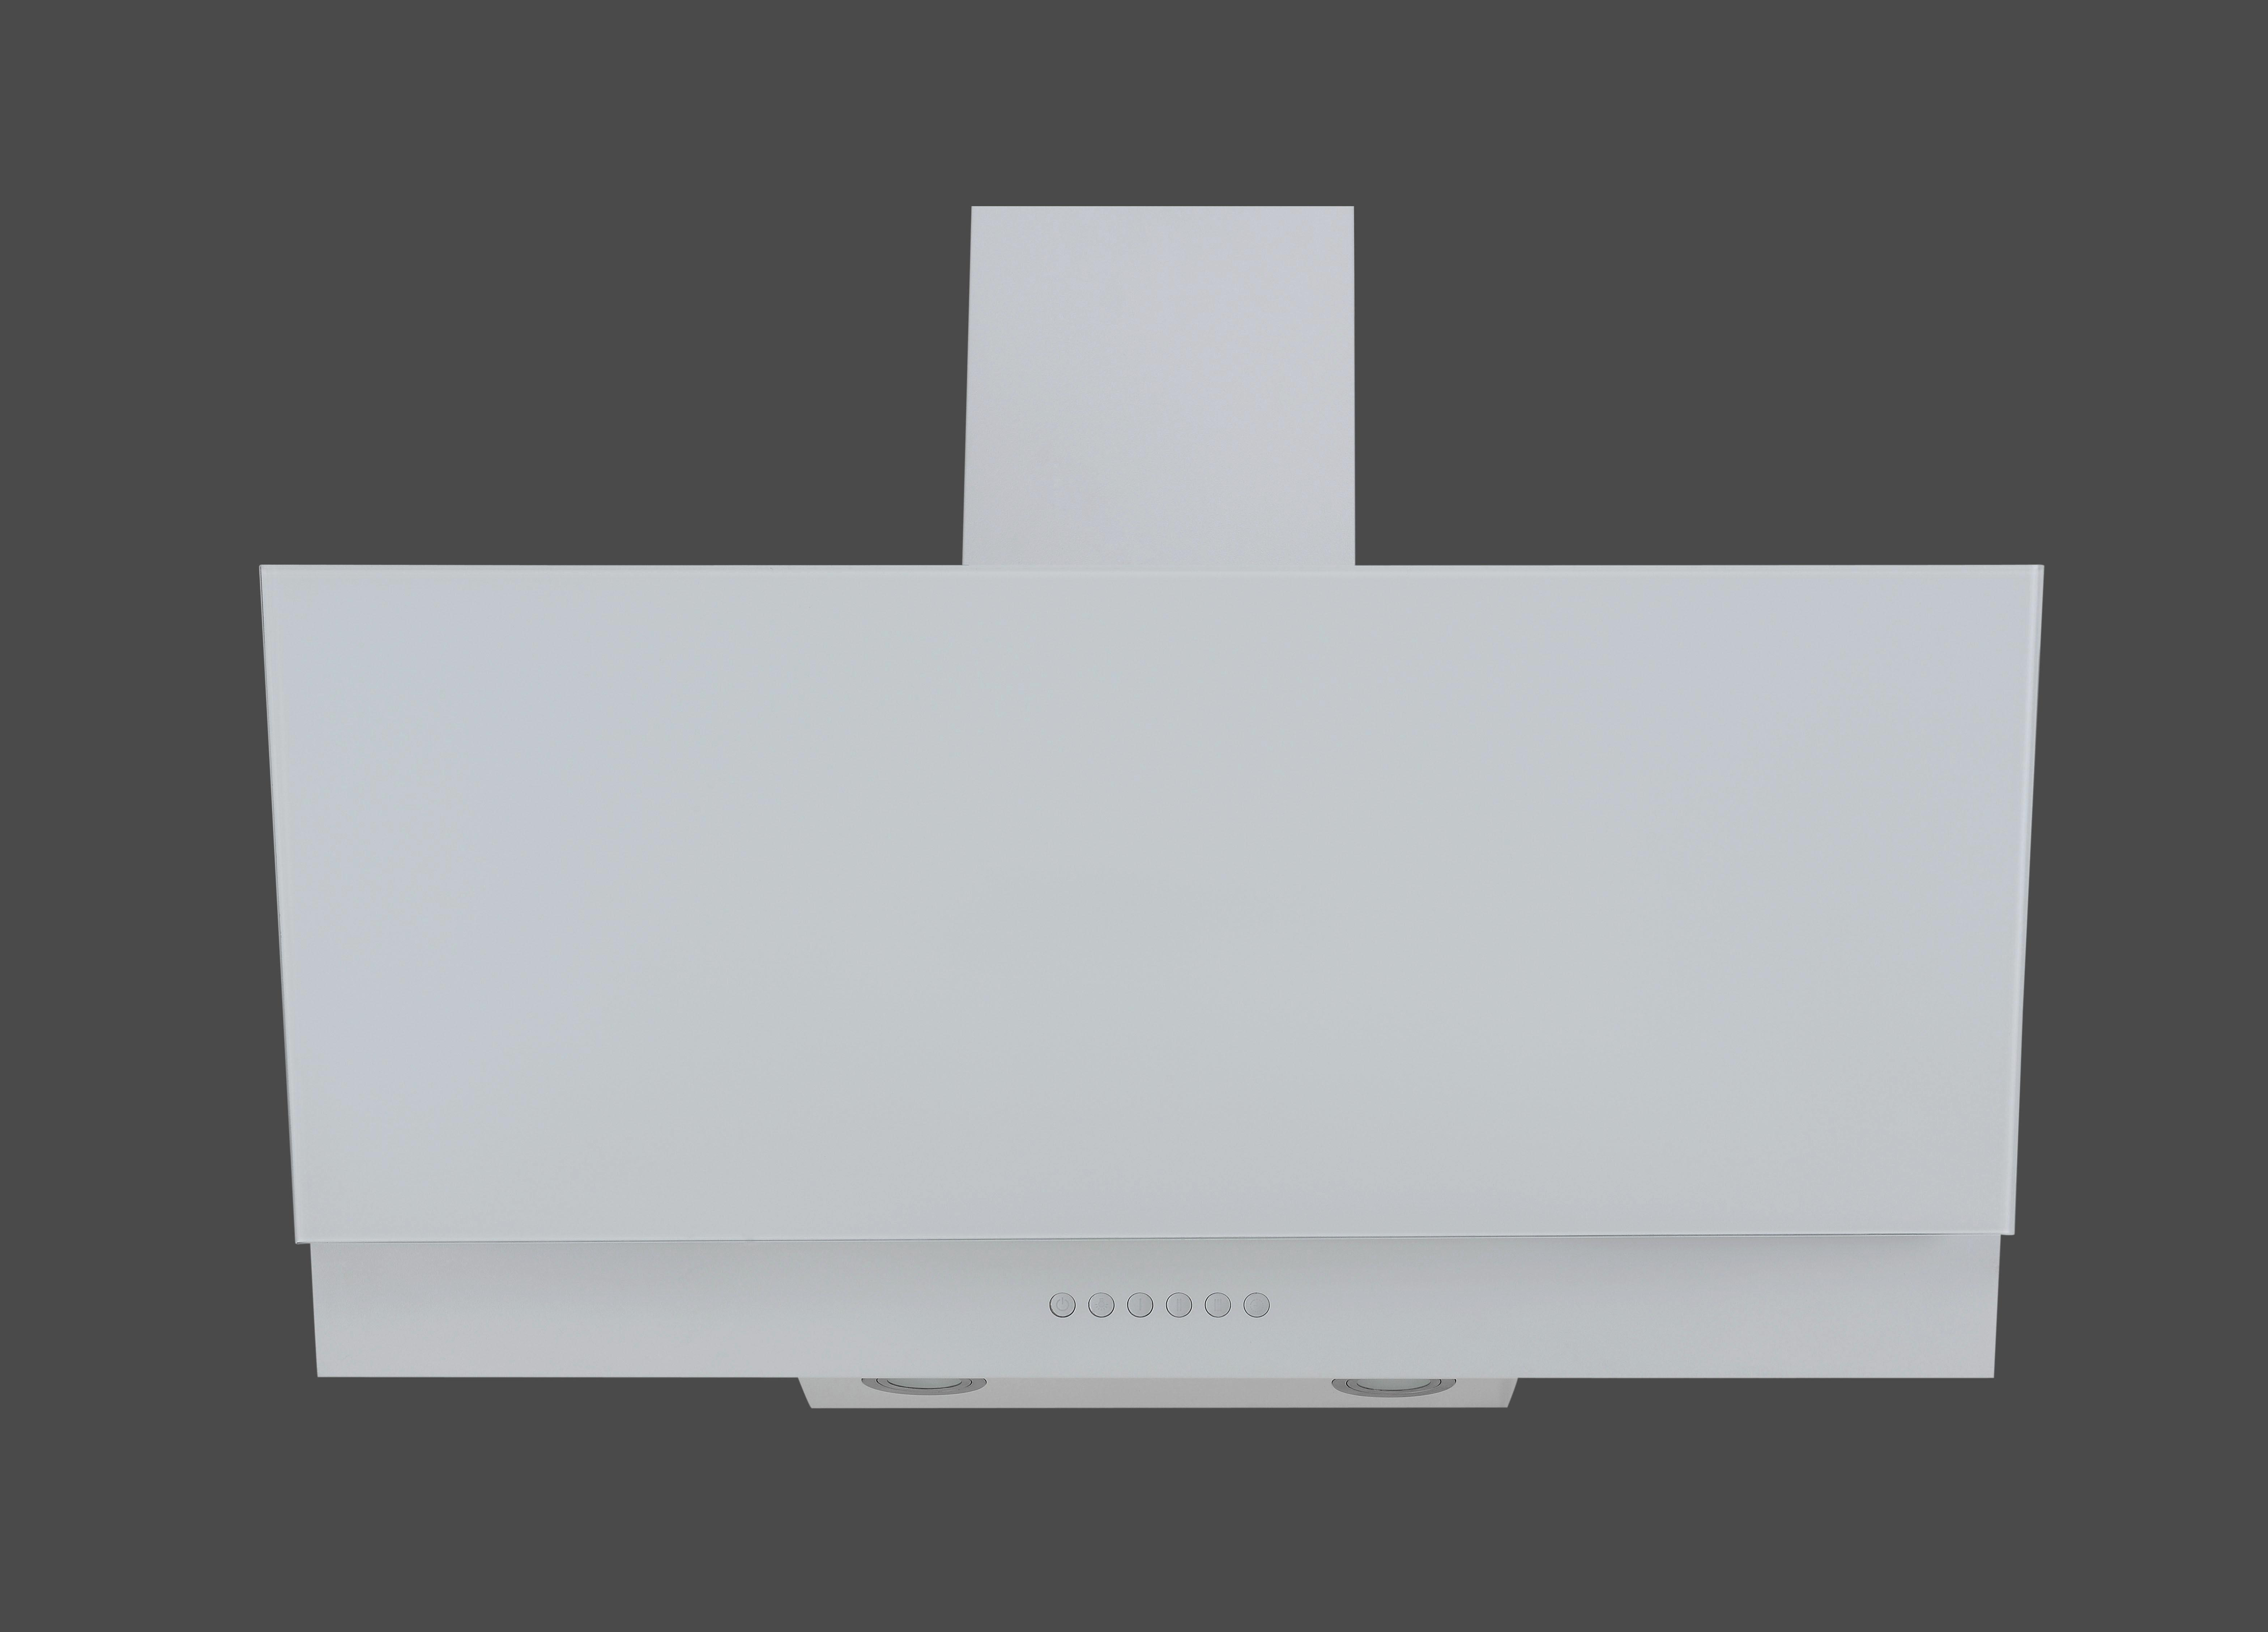 Dunstabzugshaube Ch66038-90w - Weiß, MODERN, Metall (90/70,2-100,2/41,8cm)